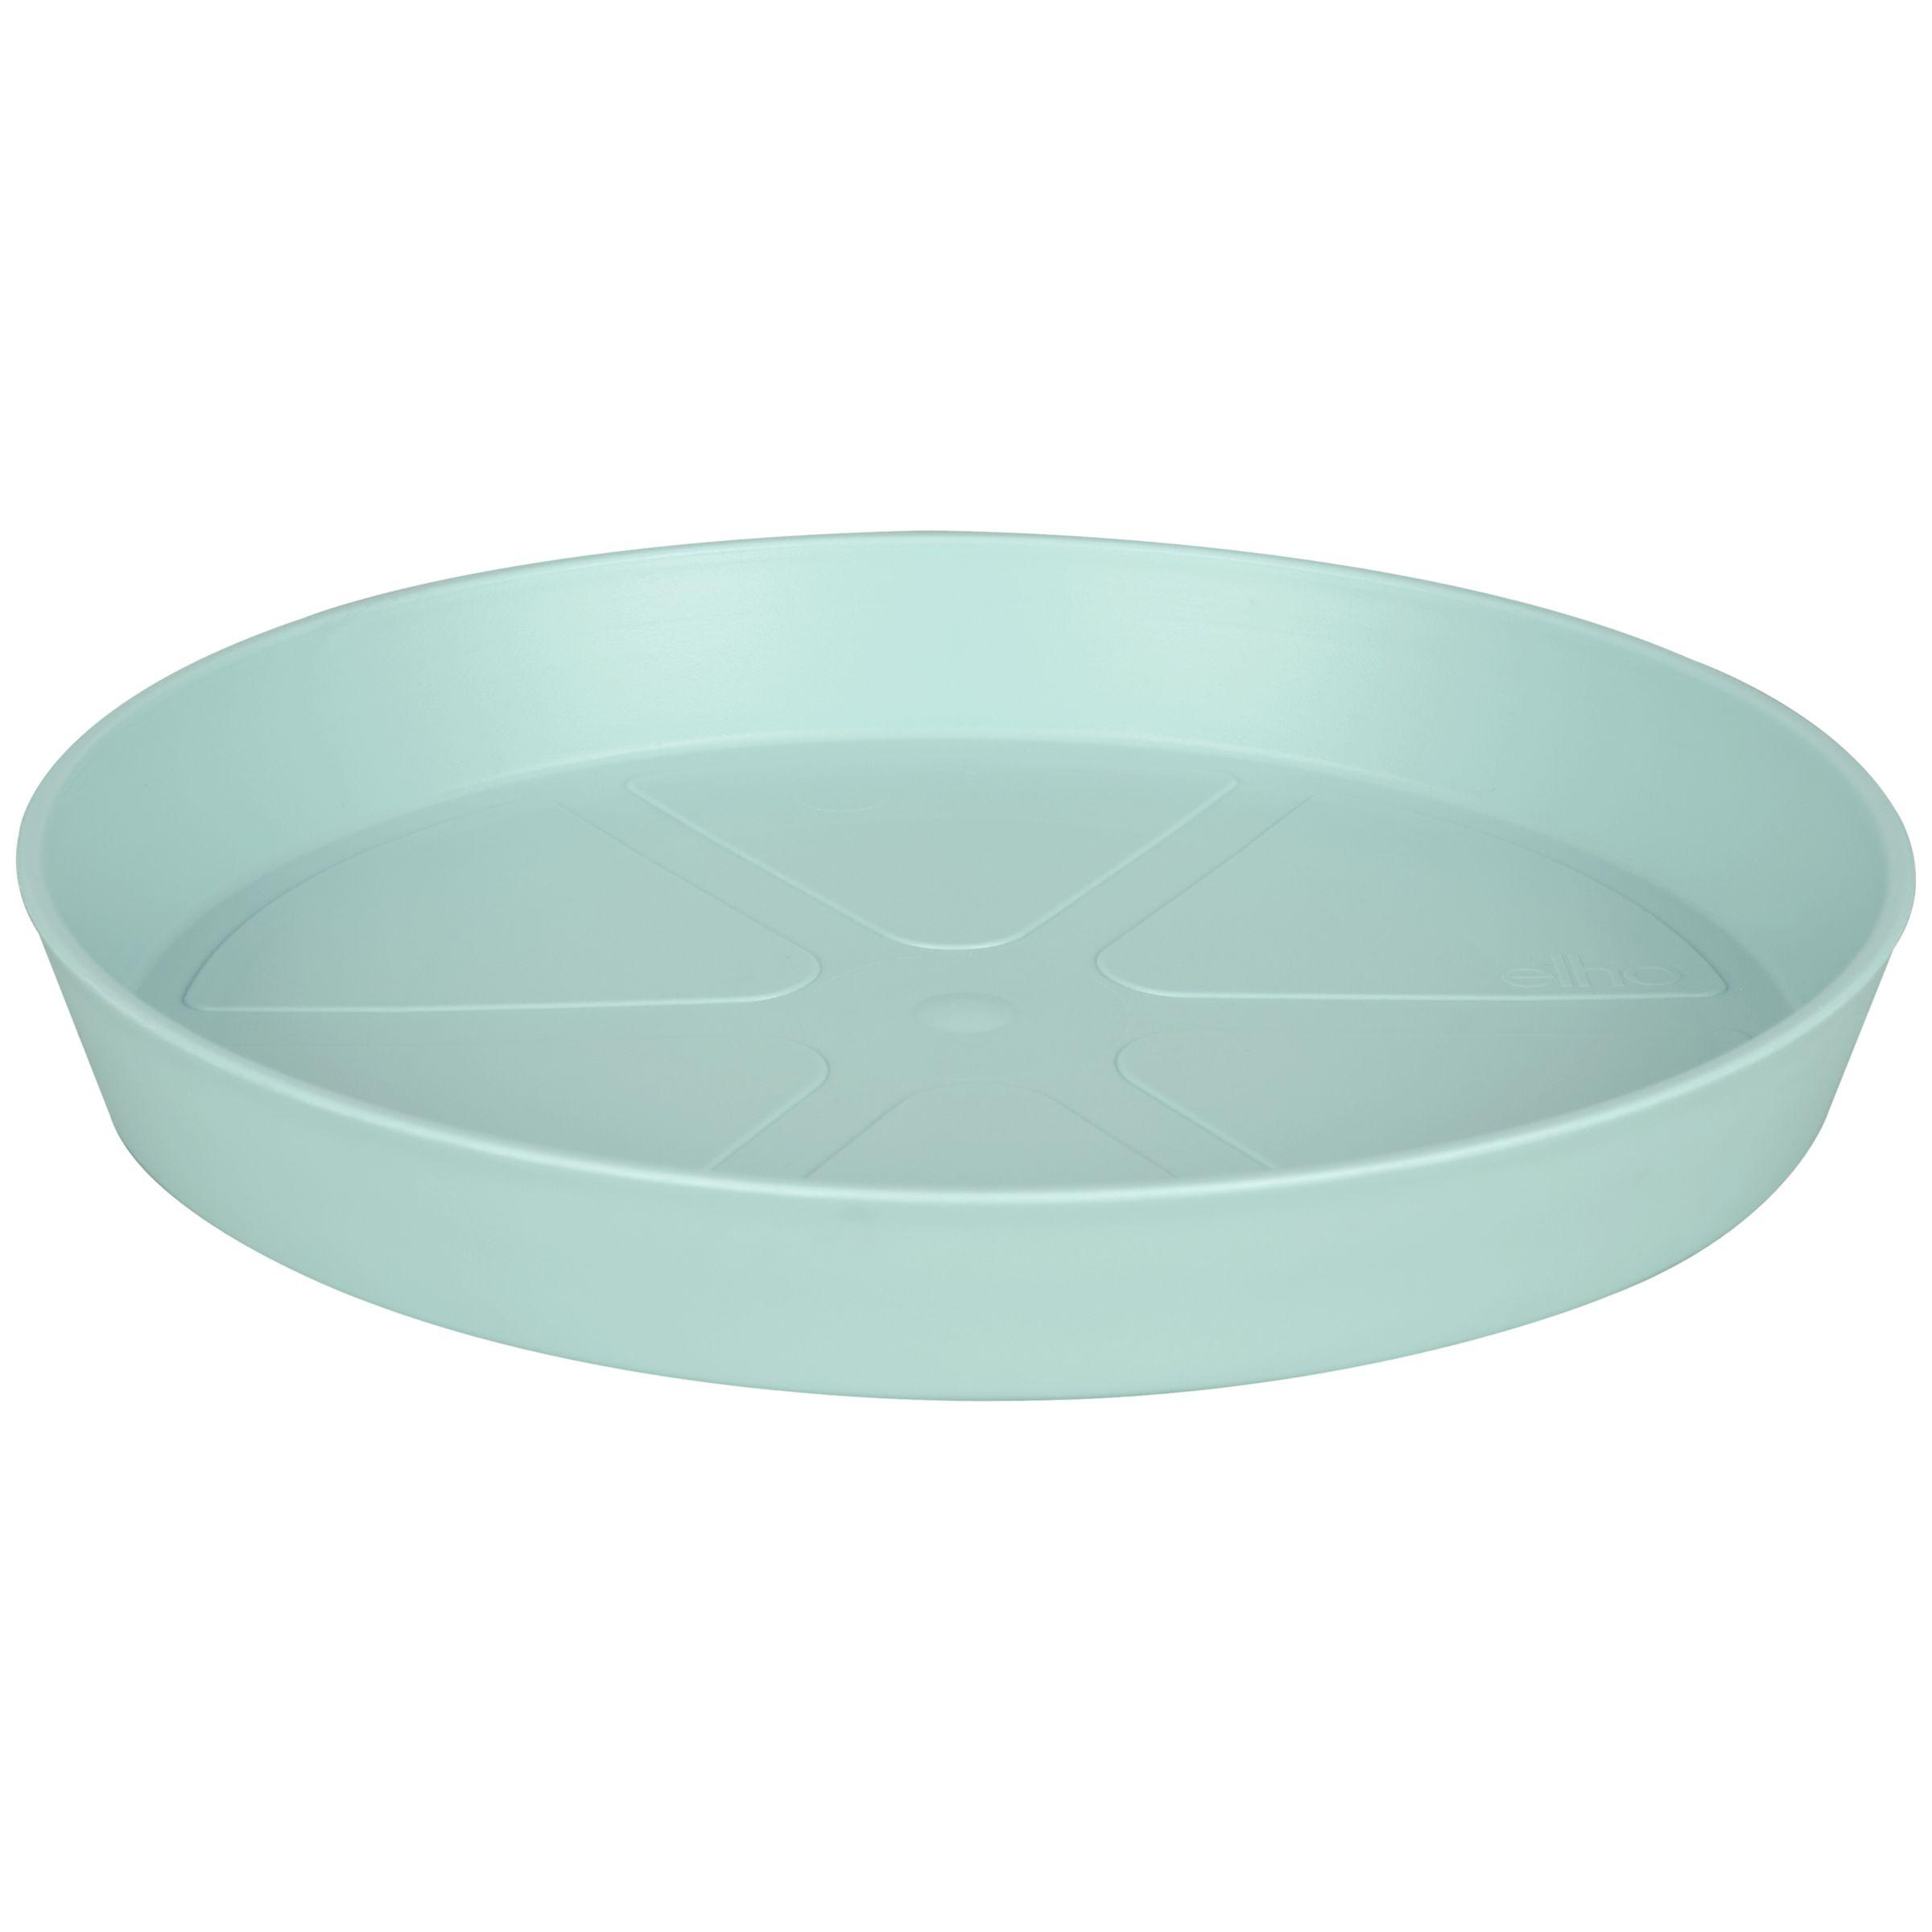 Elho Loft Saucer Round, Mint